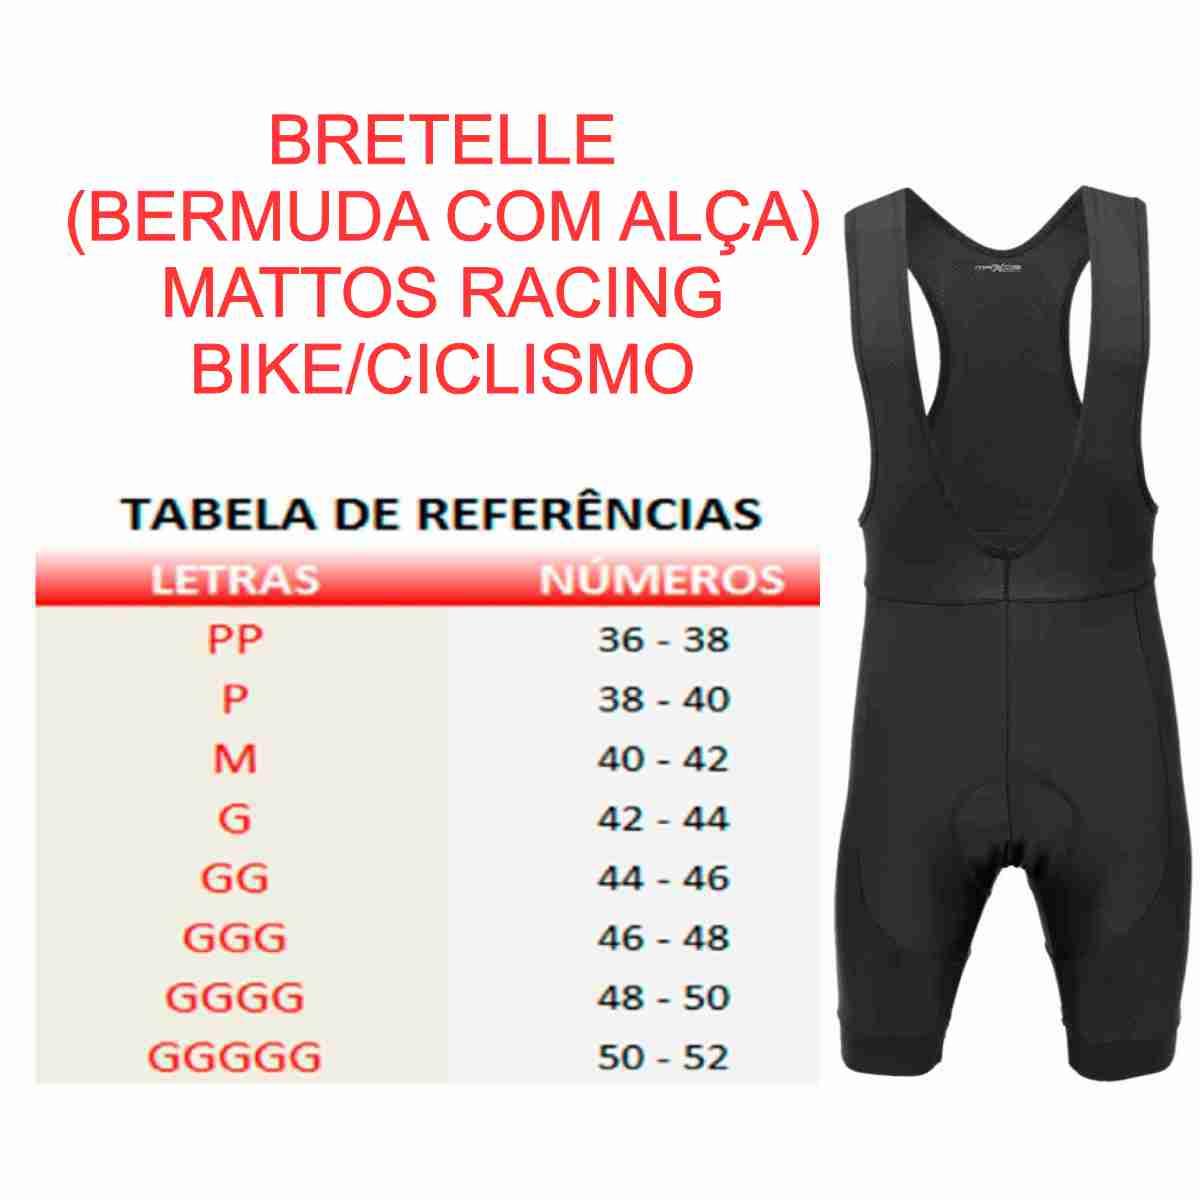 BRETELLE (BERMUDA COM ALÇA) MATTOS RACING BIKE CICLISMO PRETO